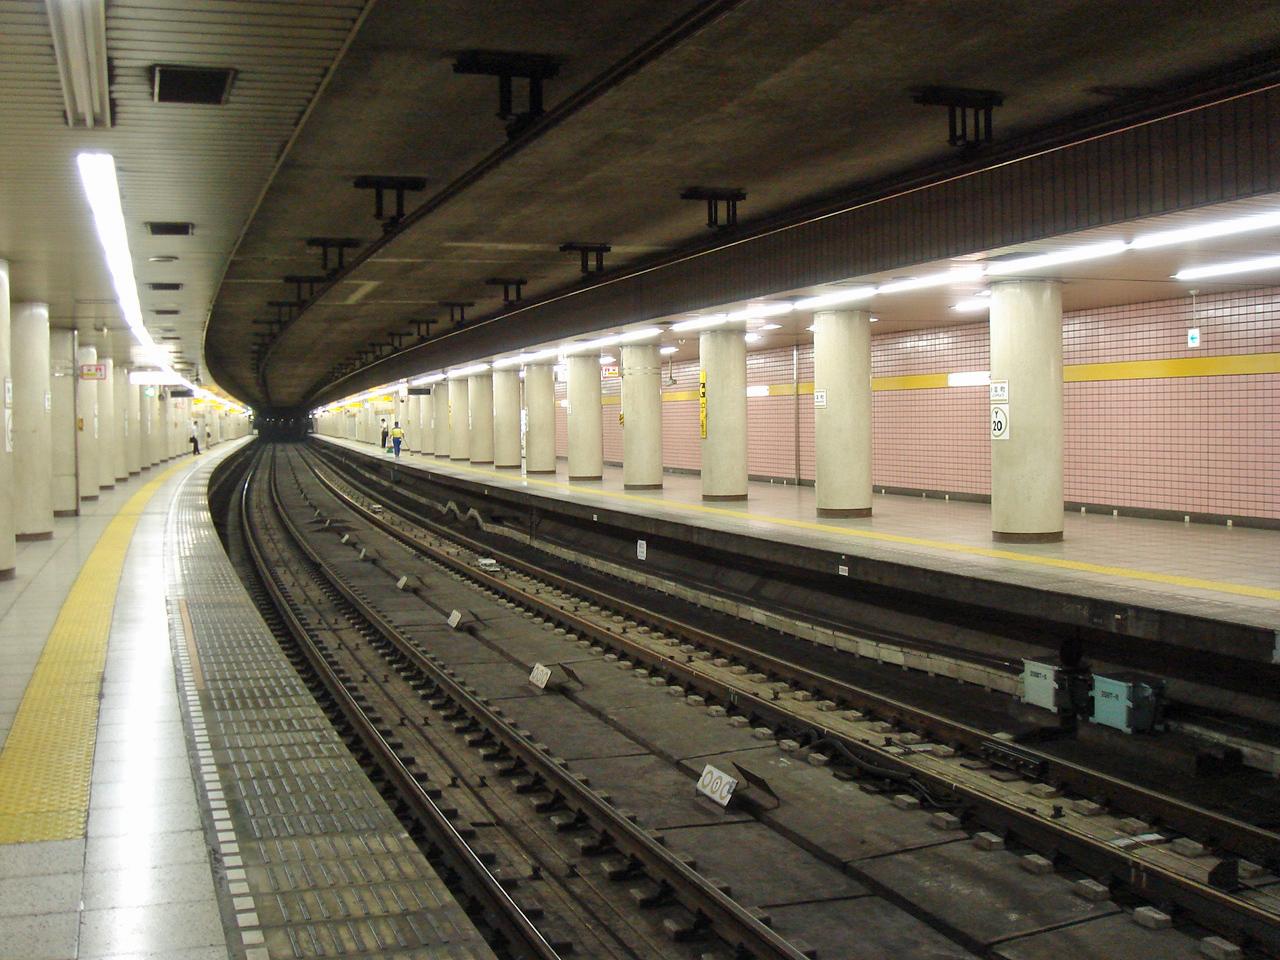 https://upload.wikimedia.org/wikipedia/commons/9/92/Shintomicho_Station_platform_2006.jpg